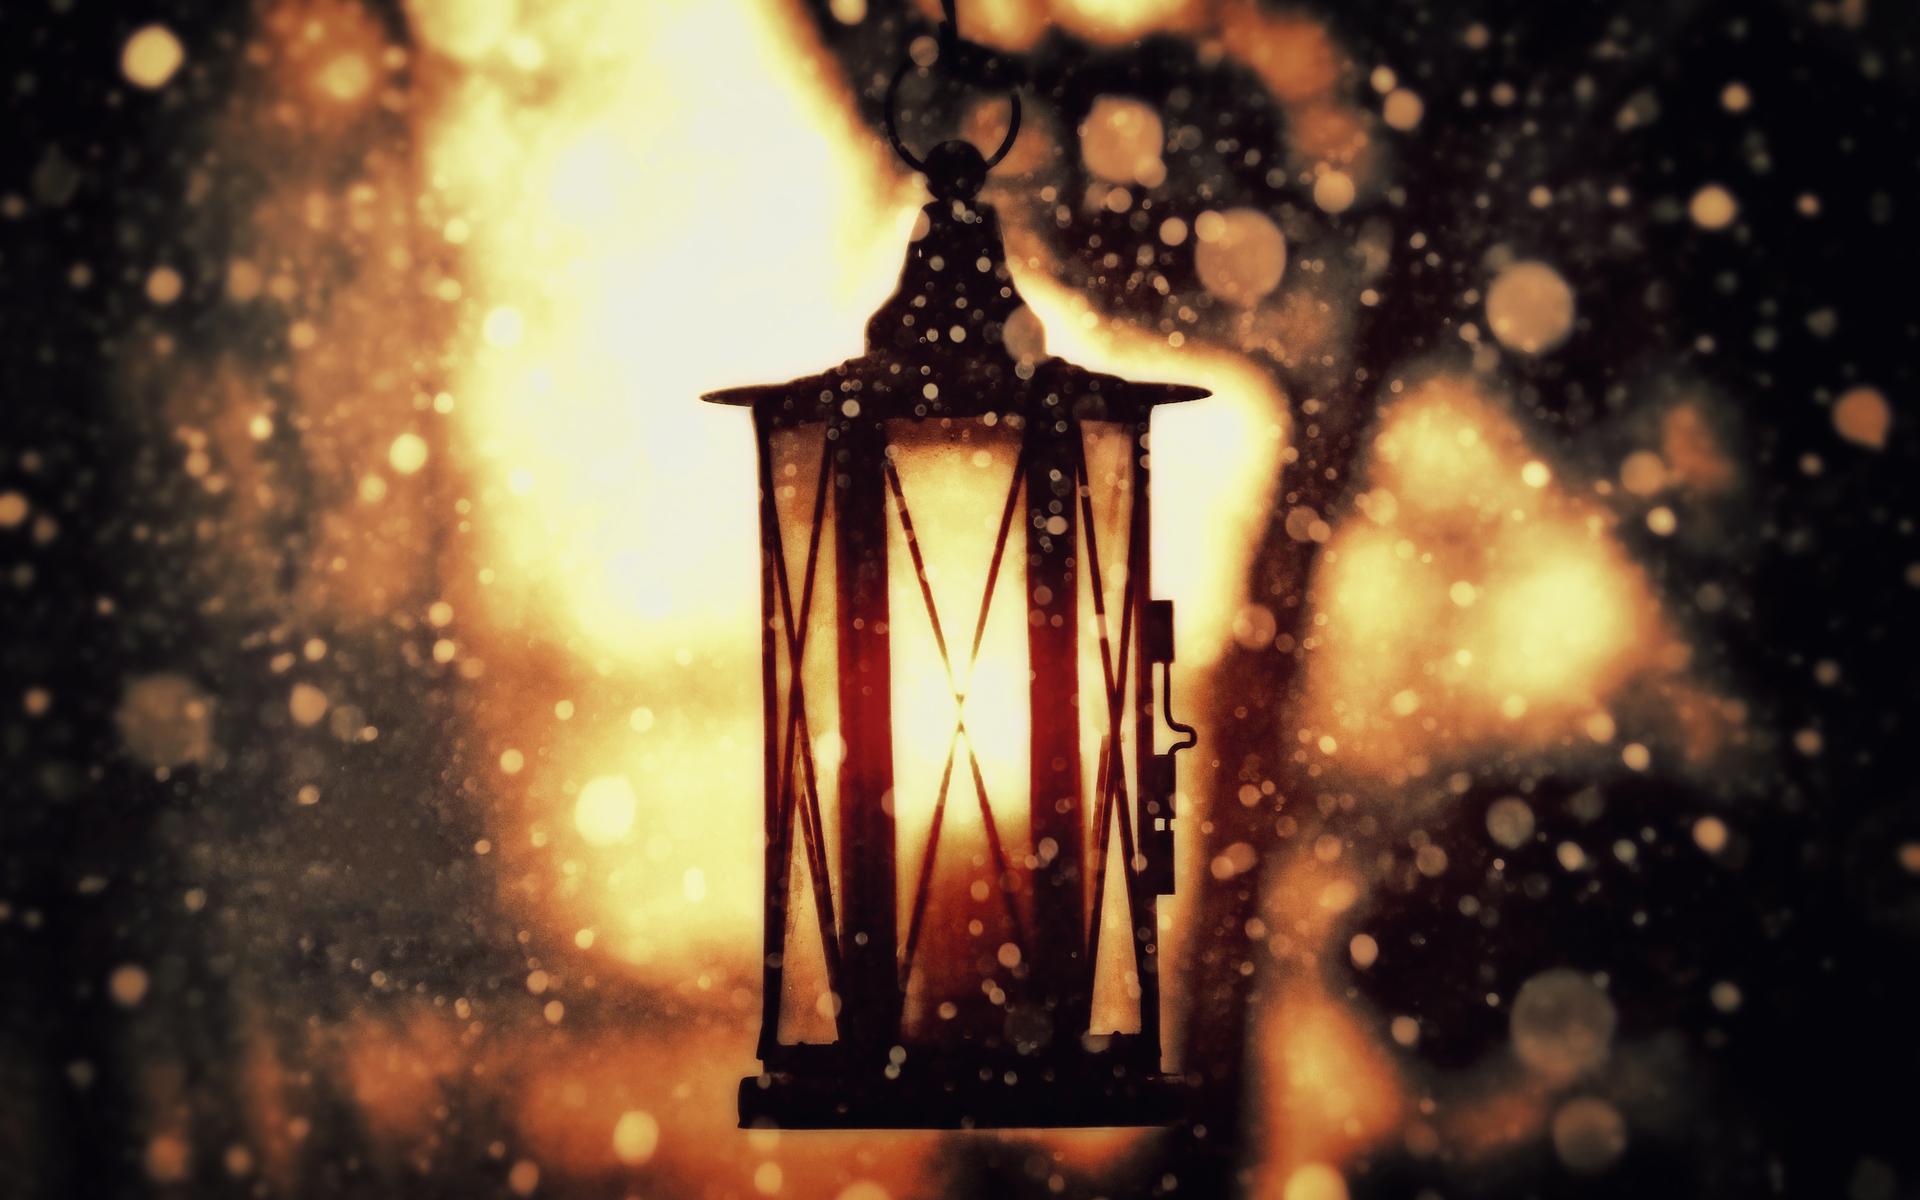 Snow Lantern Wallpapers   1920x1200   1310099 1920x1200